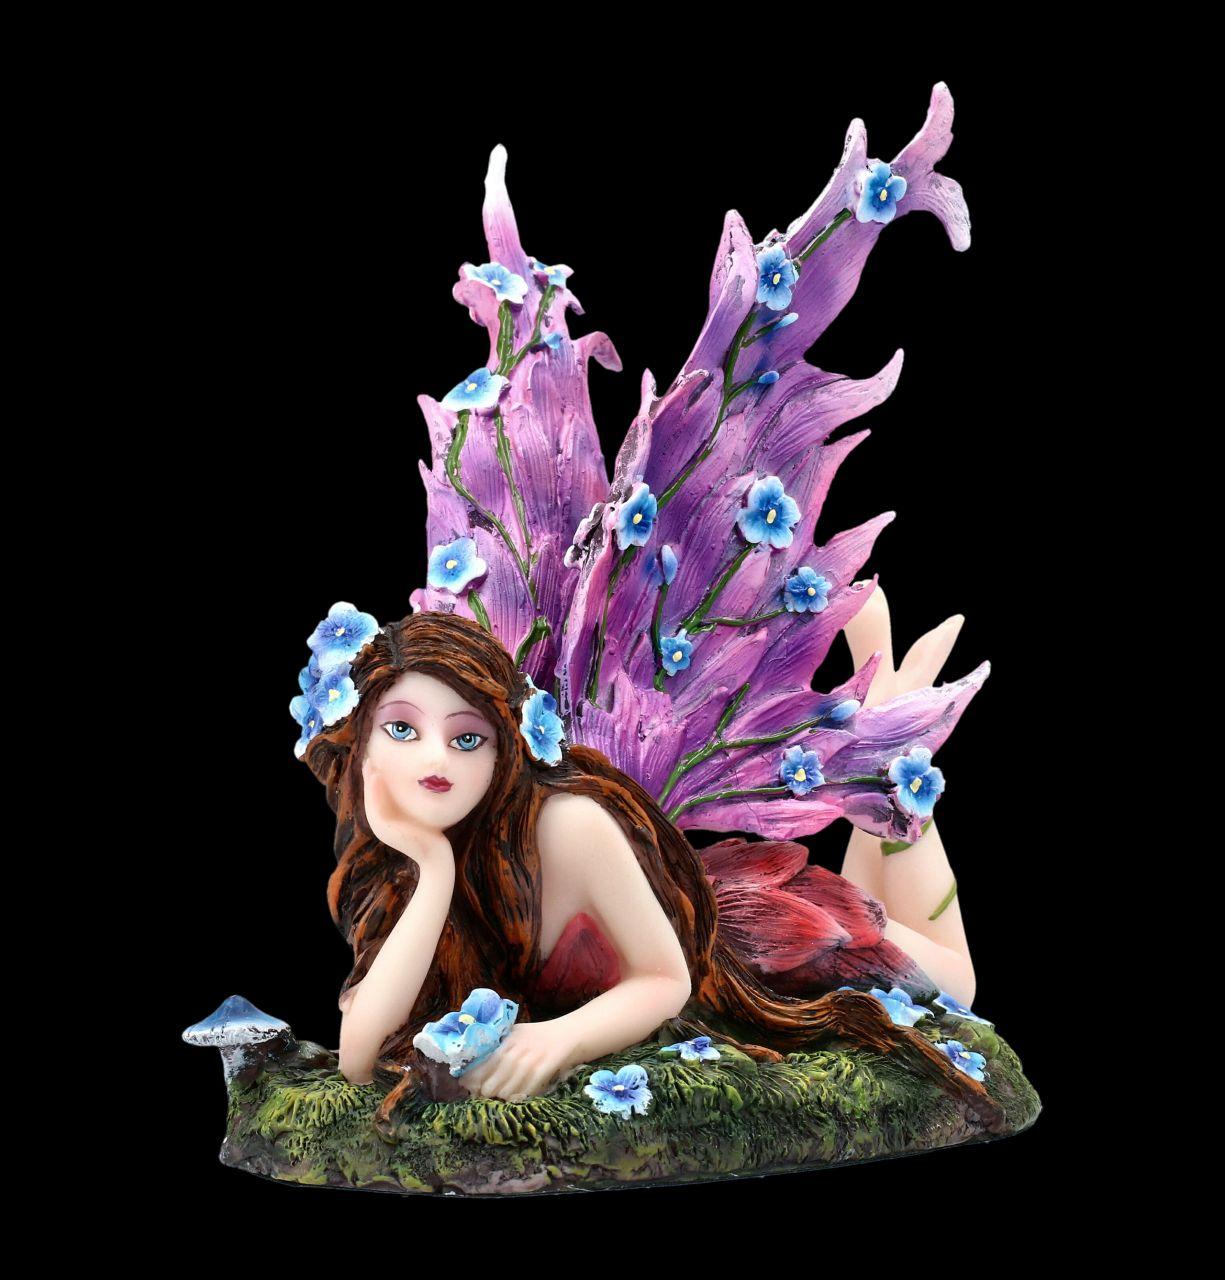 Fairy Figurine - Ara with Wings of Flowers